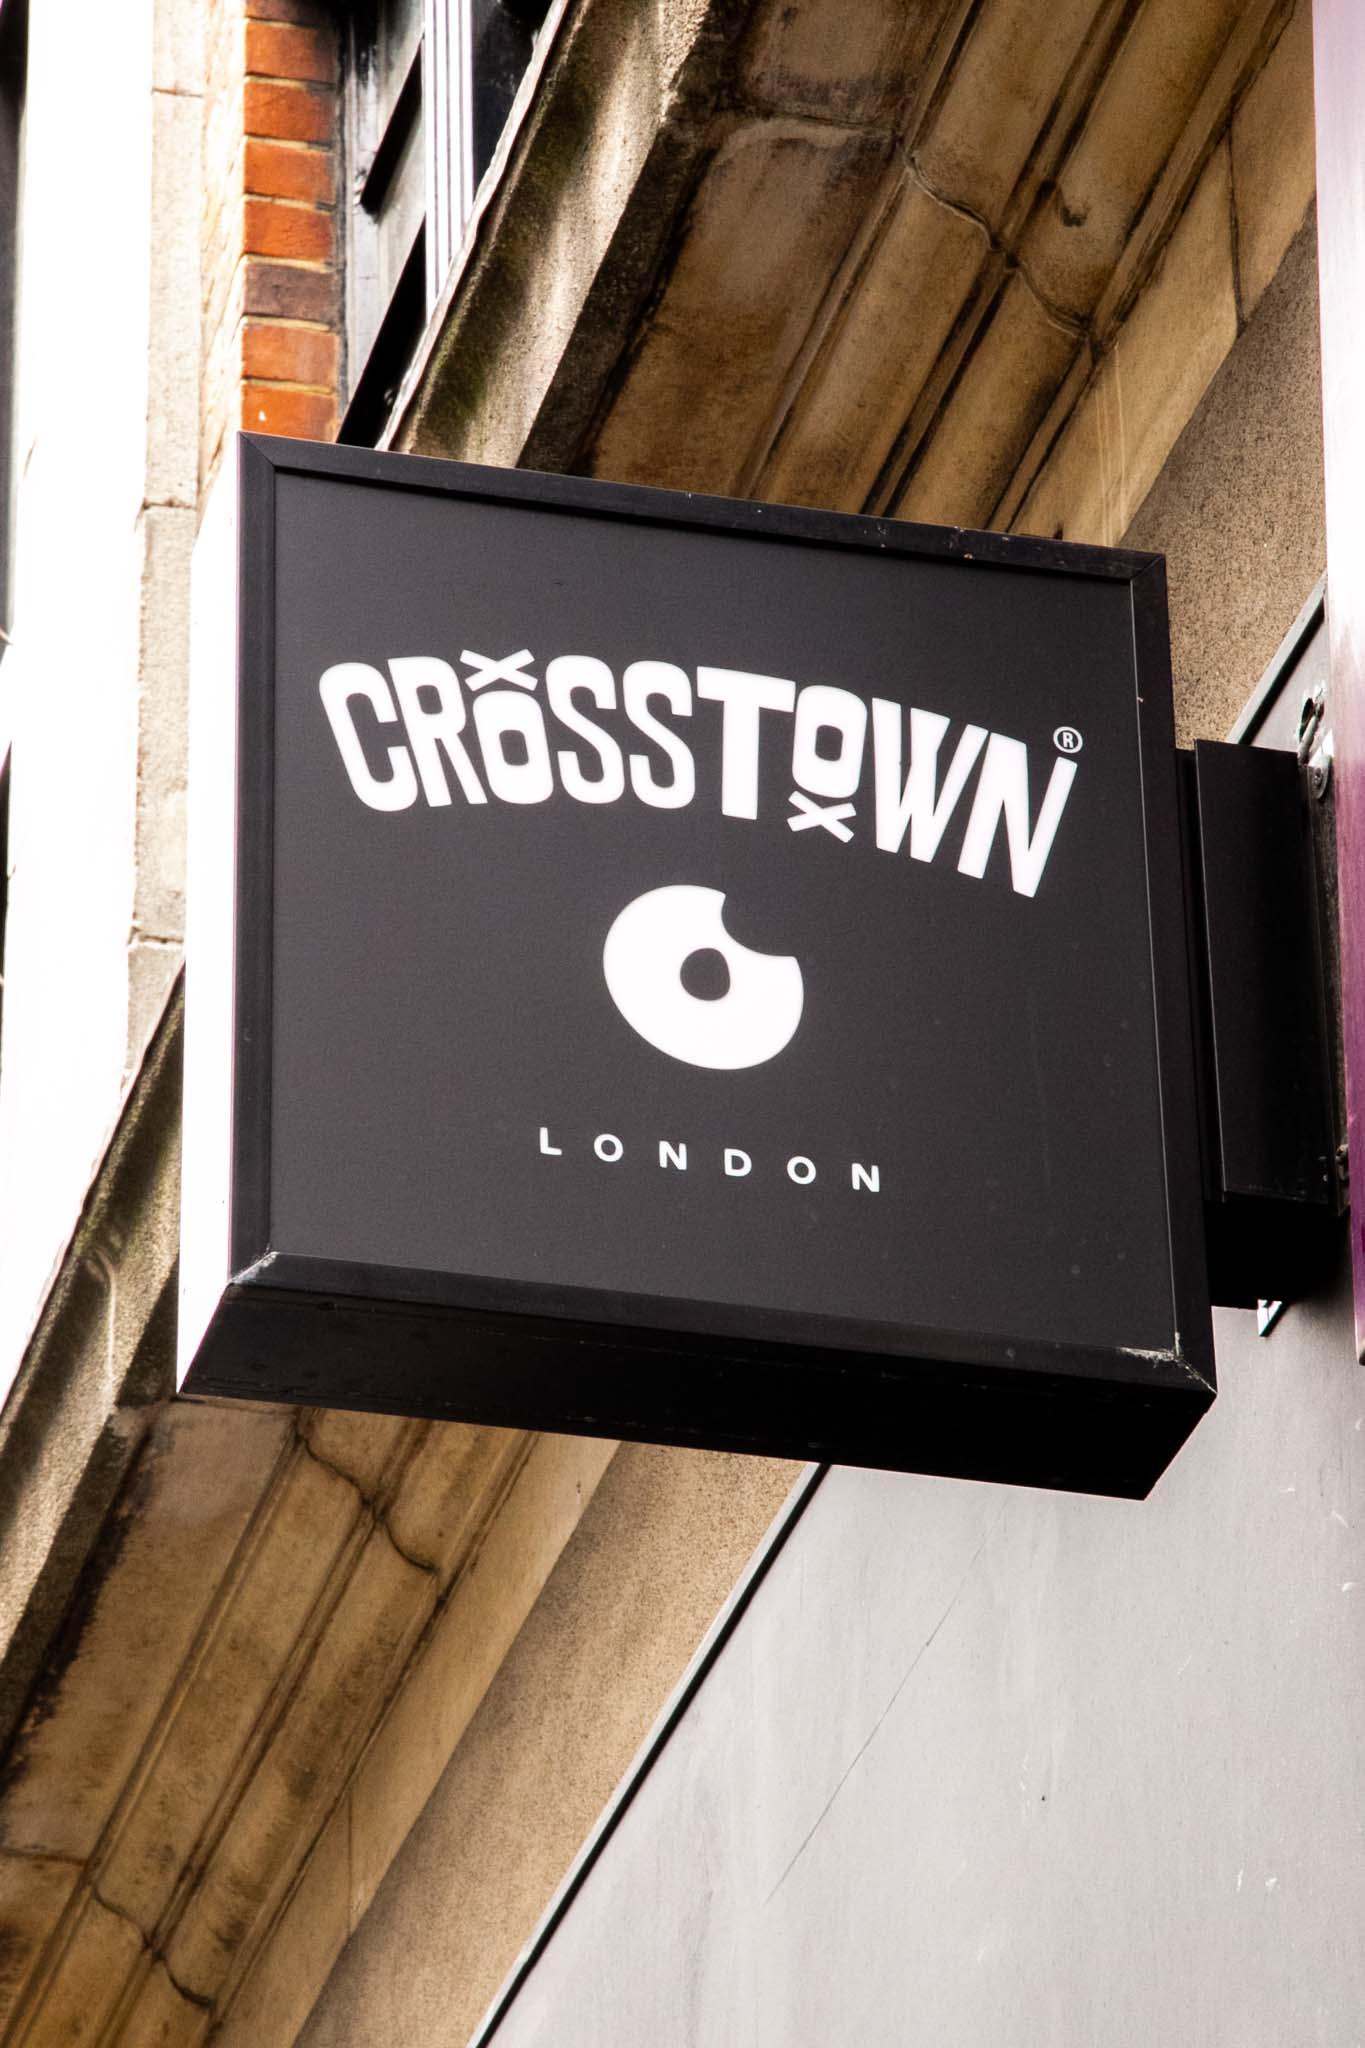 Crosstown soho brand identity